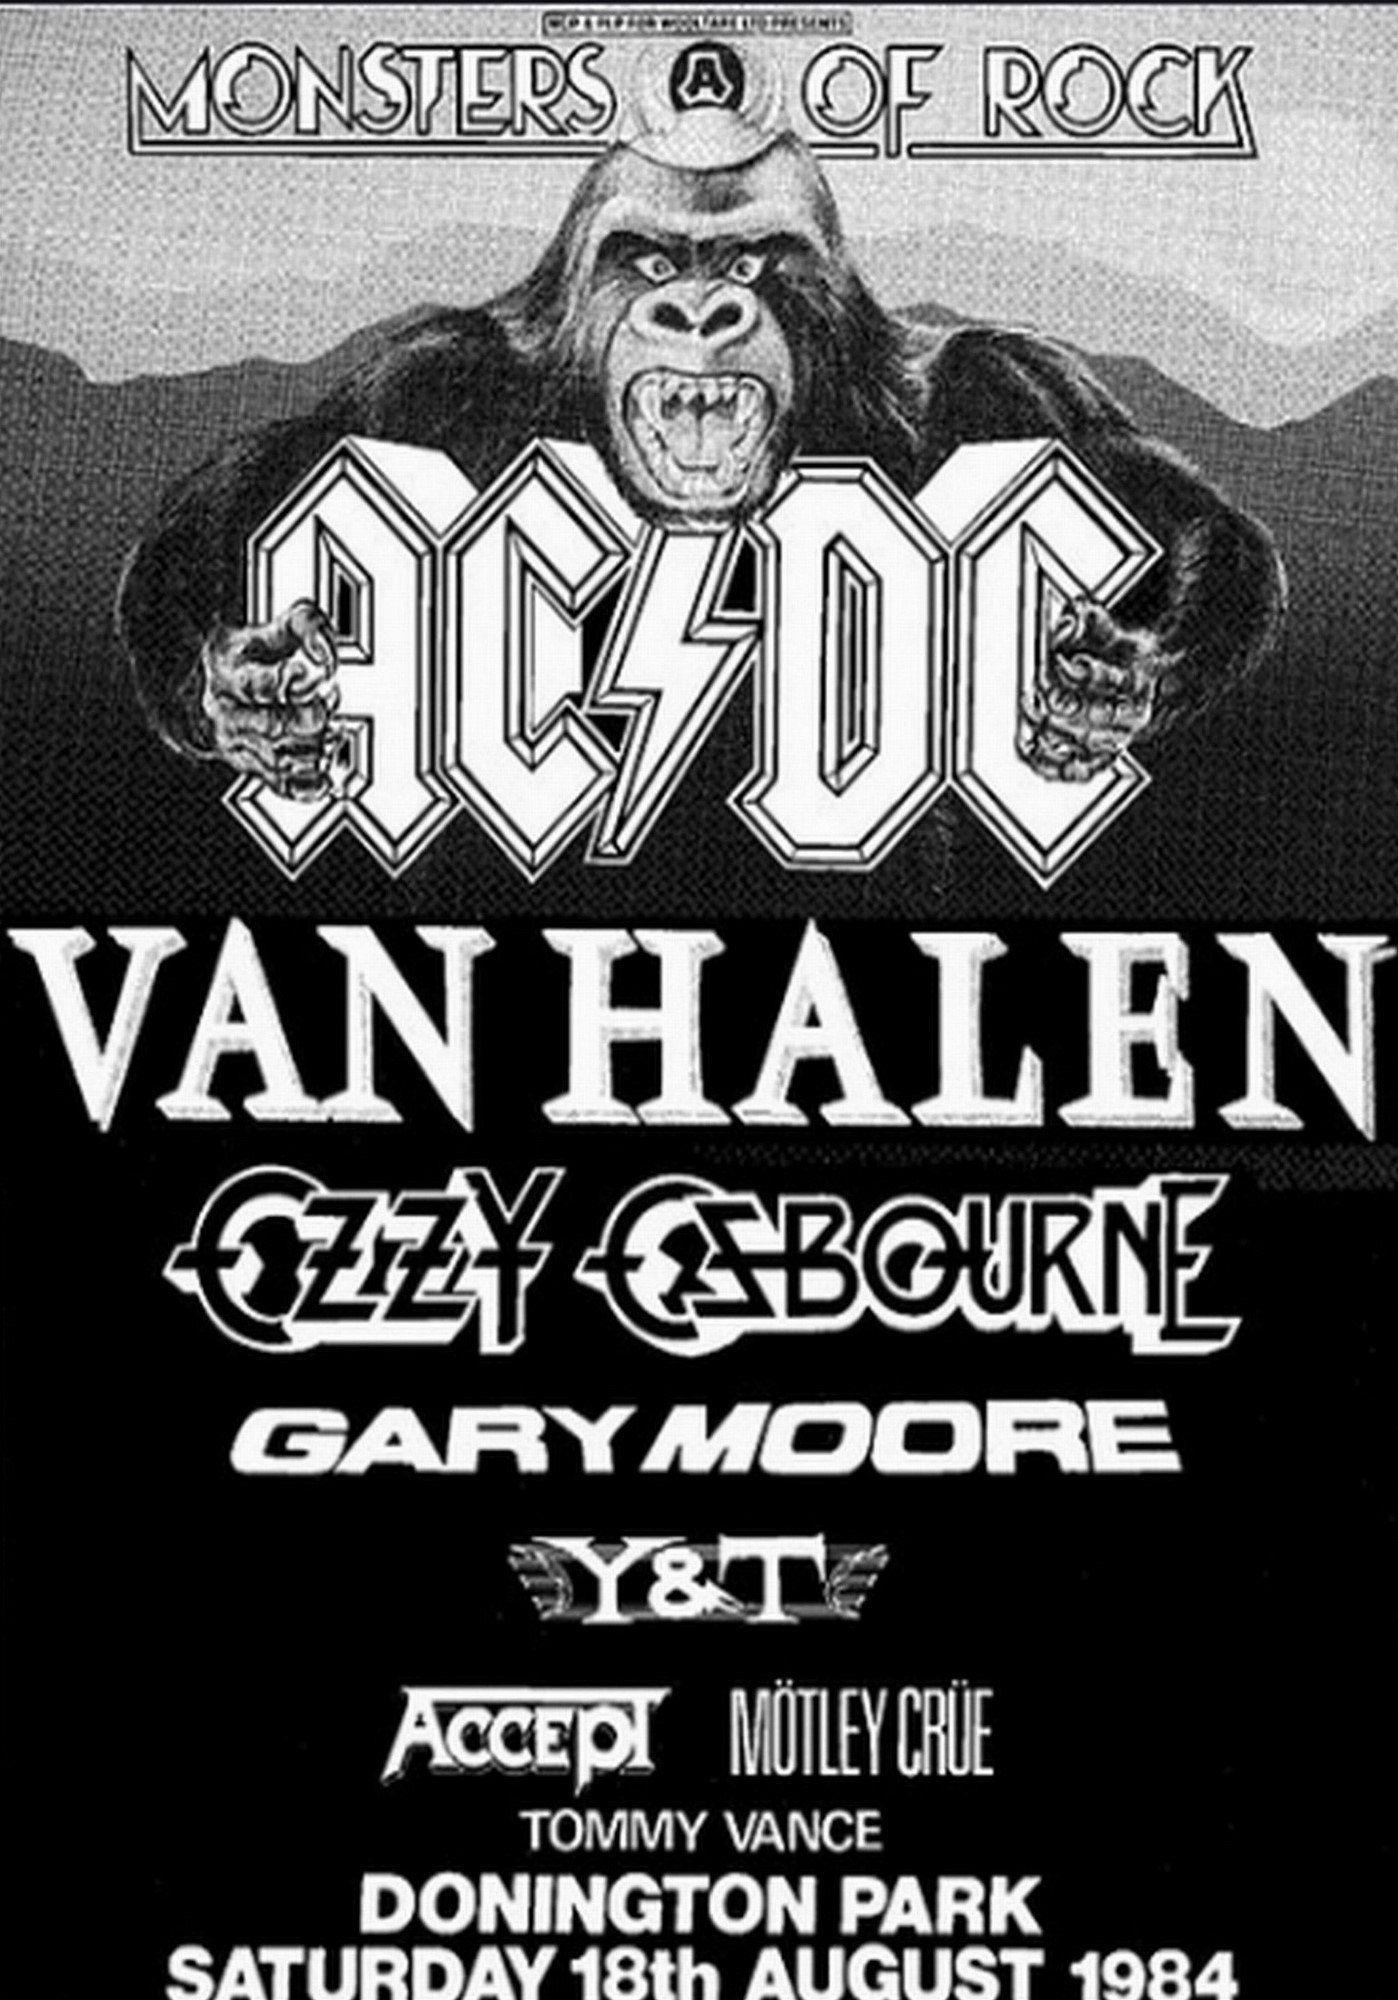 Ac Dc Vintage Poster Monsters Of Rock Castle Donington Uk 1984 Concert Posters Band Posters Rock Poster Art